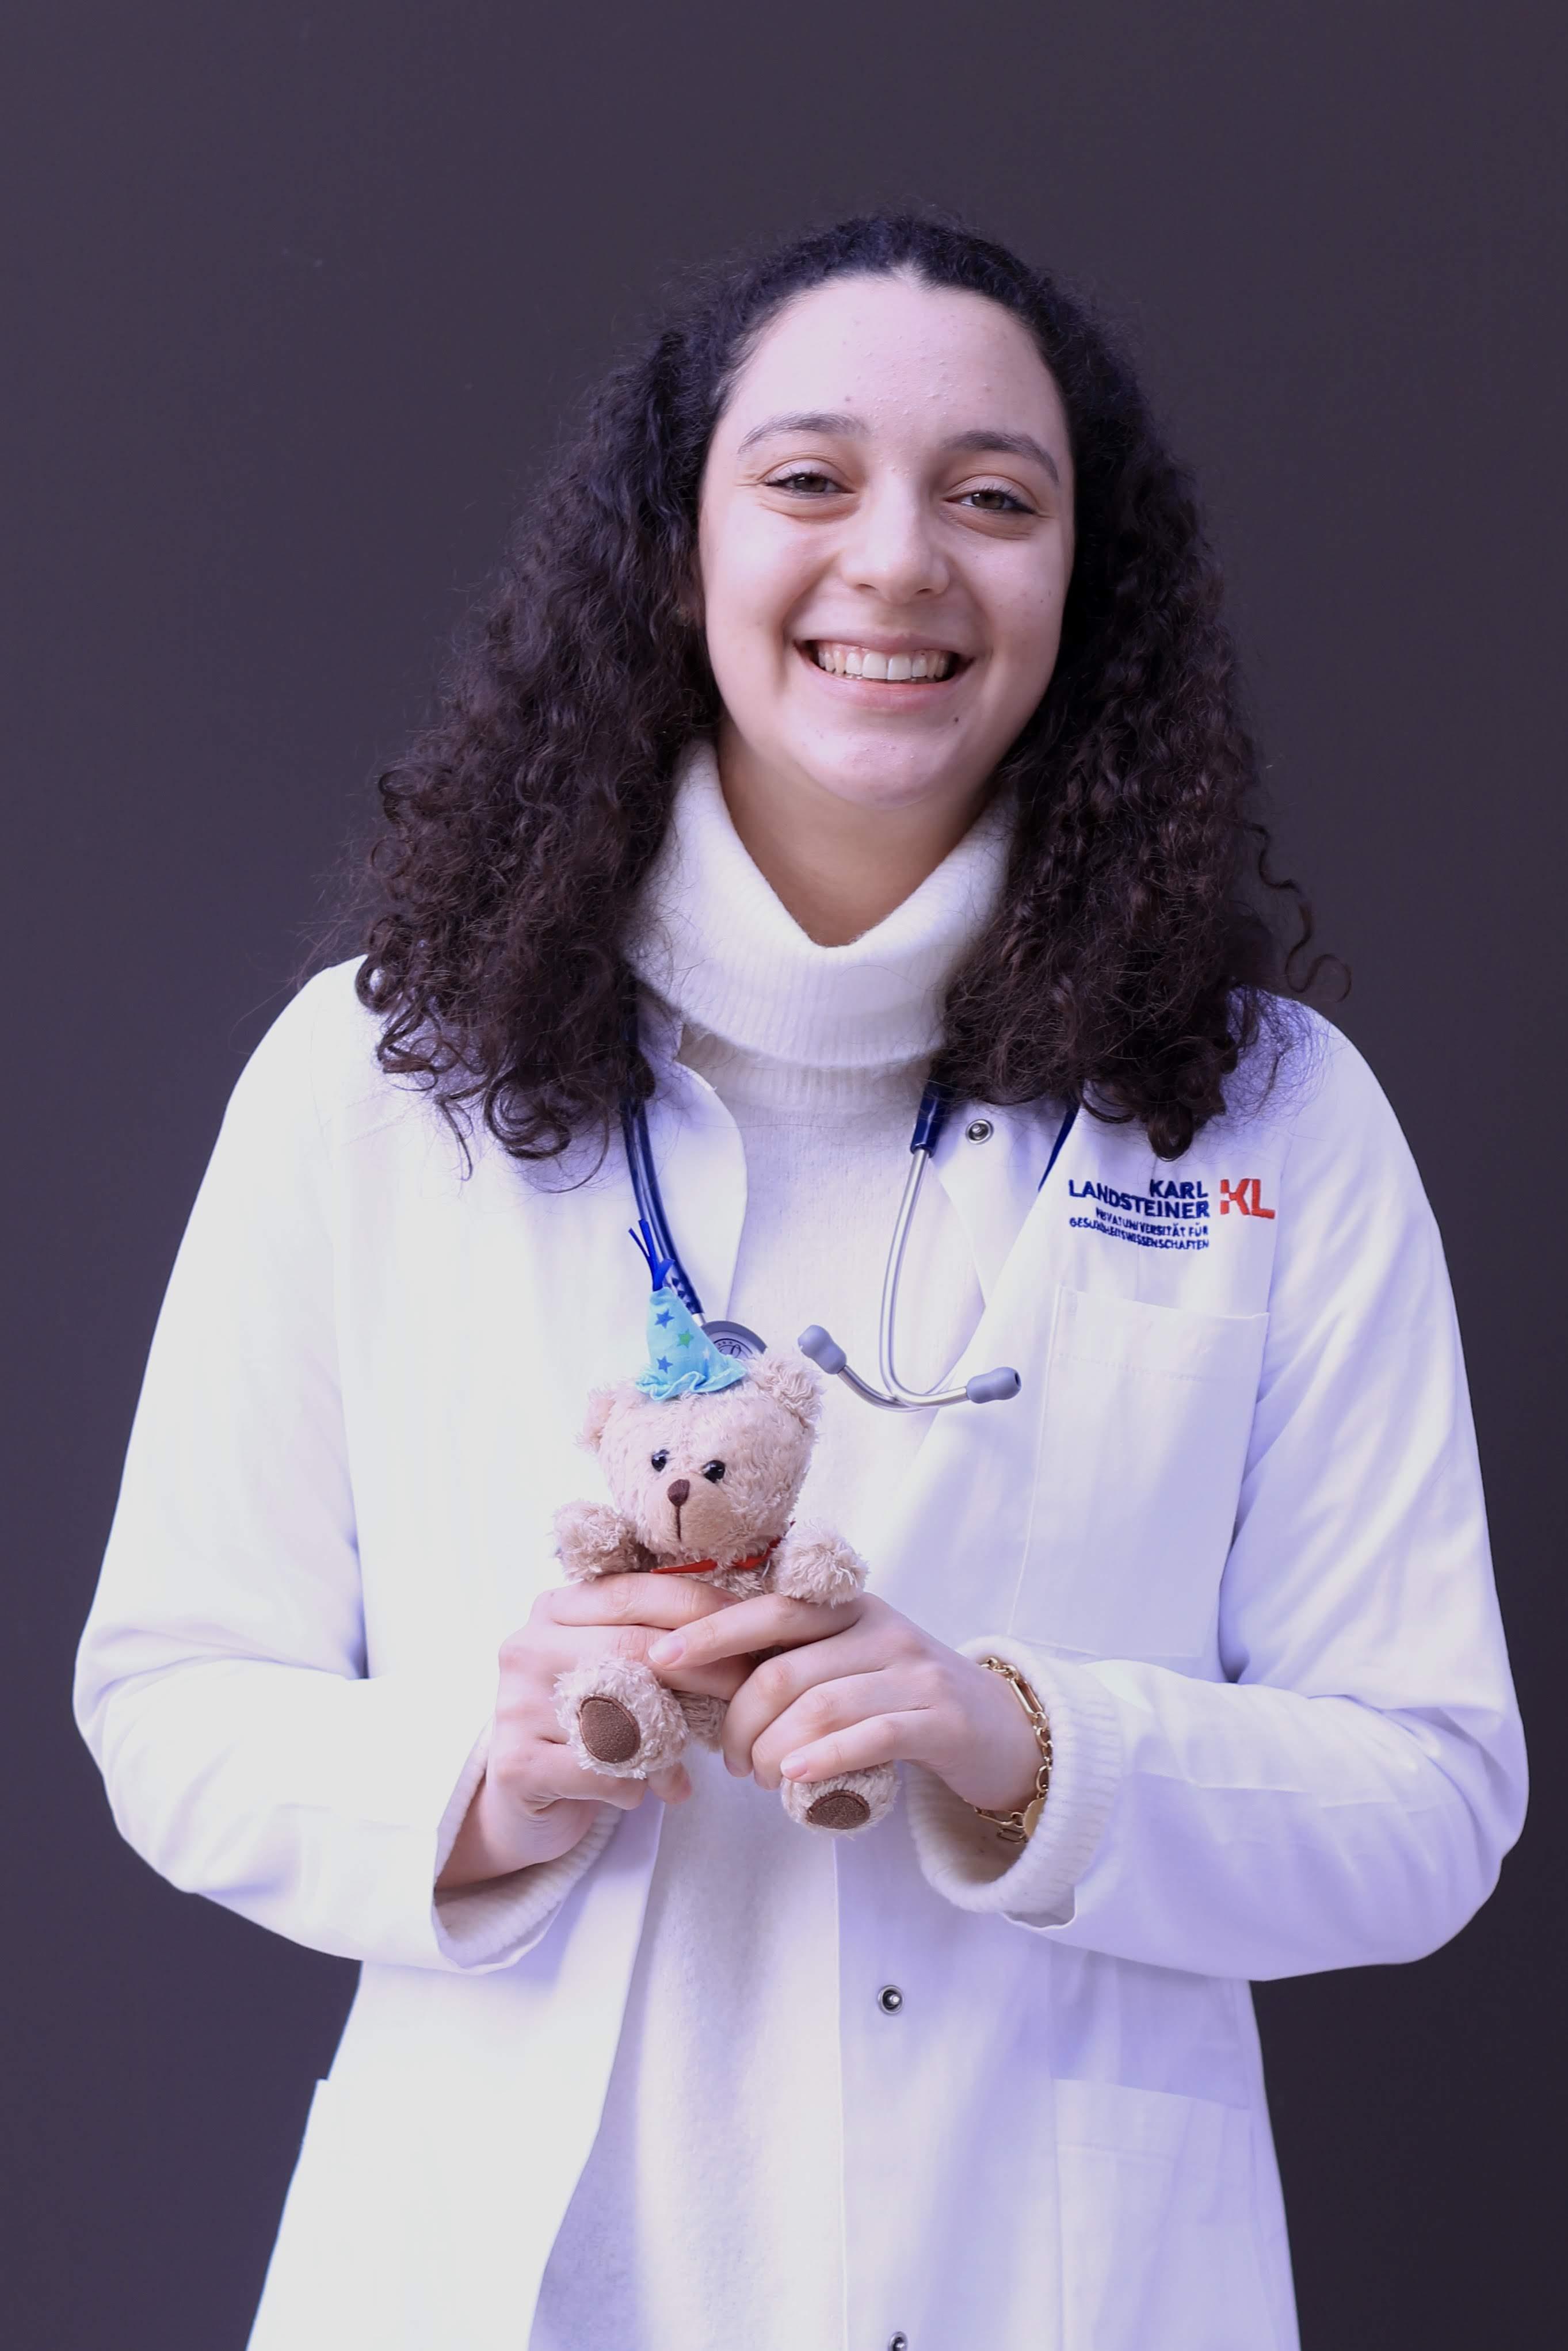 Alisa Roskos